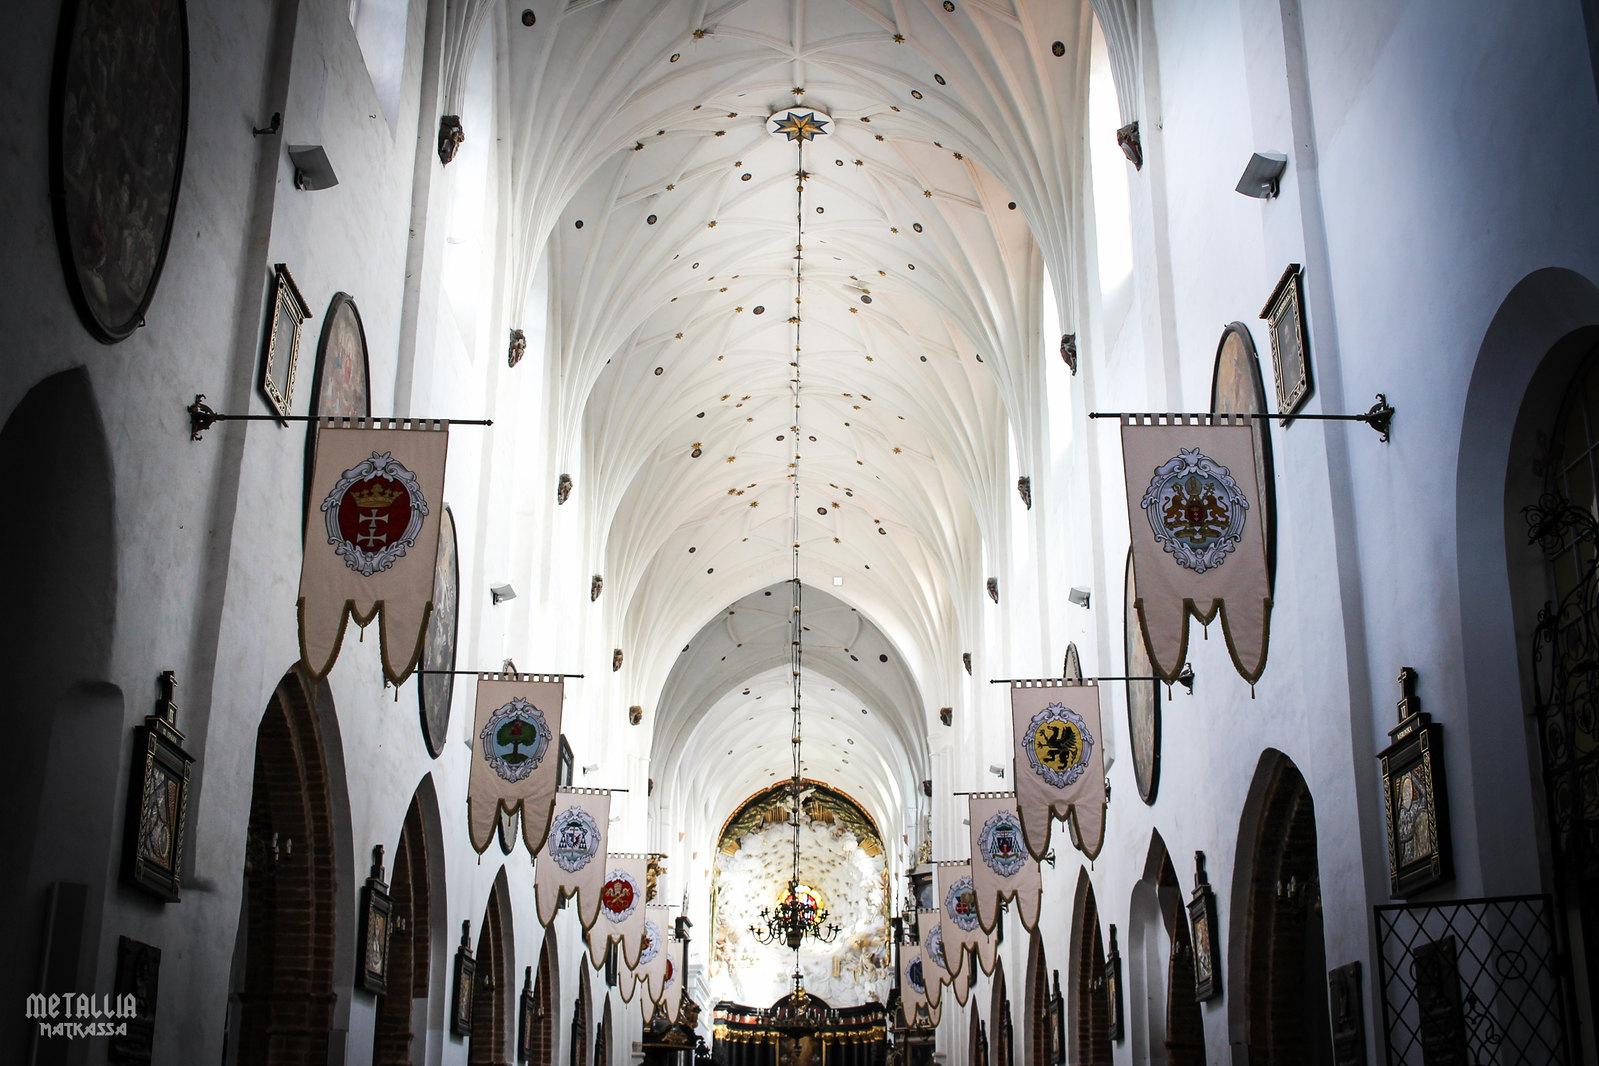 park oliwa, gdansk oliwa, gdanskin nähtävyydet, sightseeing in gdansk, oliwa cathedral, oliwan katedraali